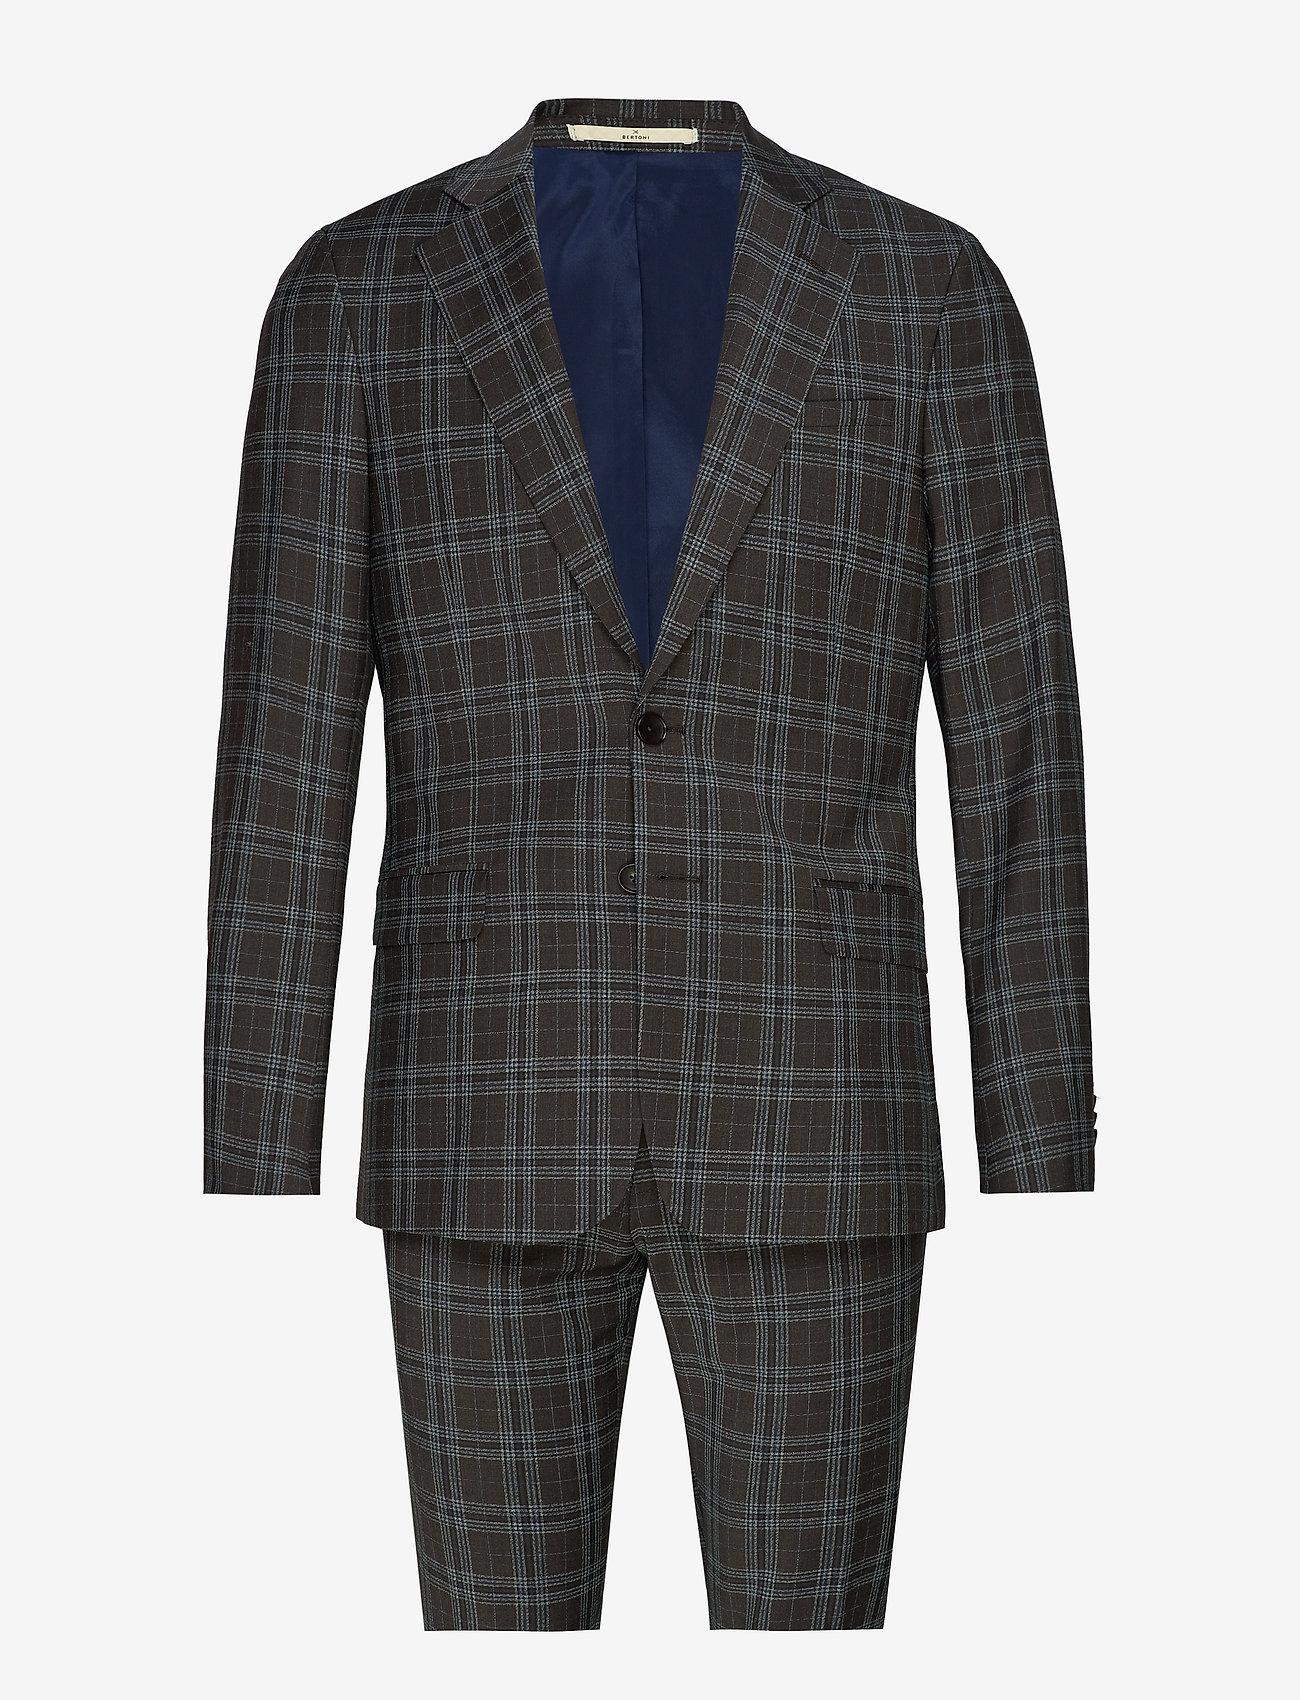 Bertoni - Ludvigsen-Ravn - single breasted suits - 870 mustang - 0